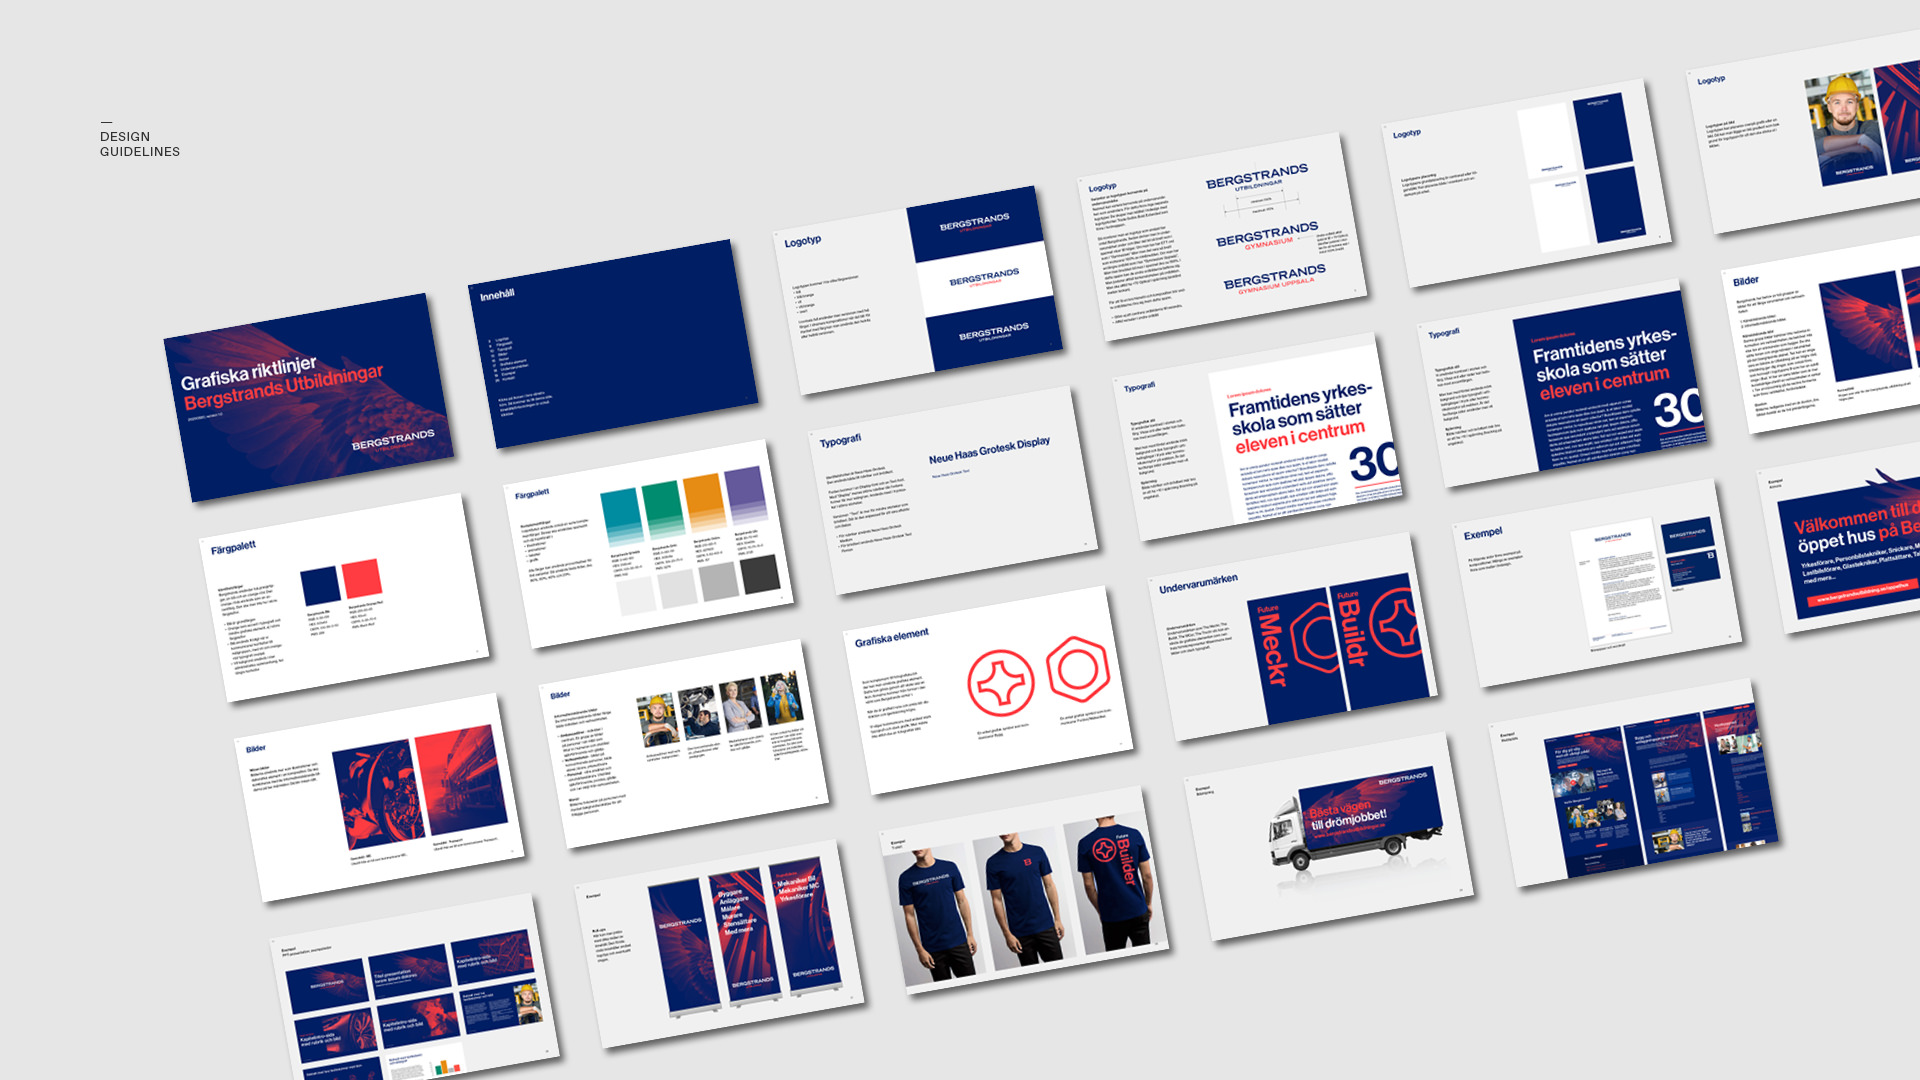 design-guidelines-bergstrand-2